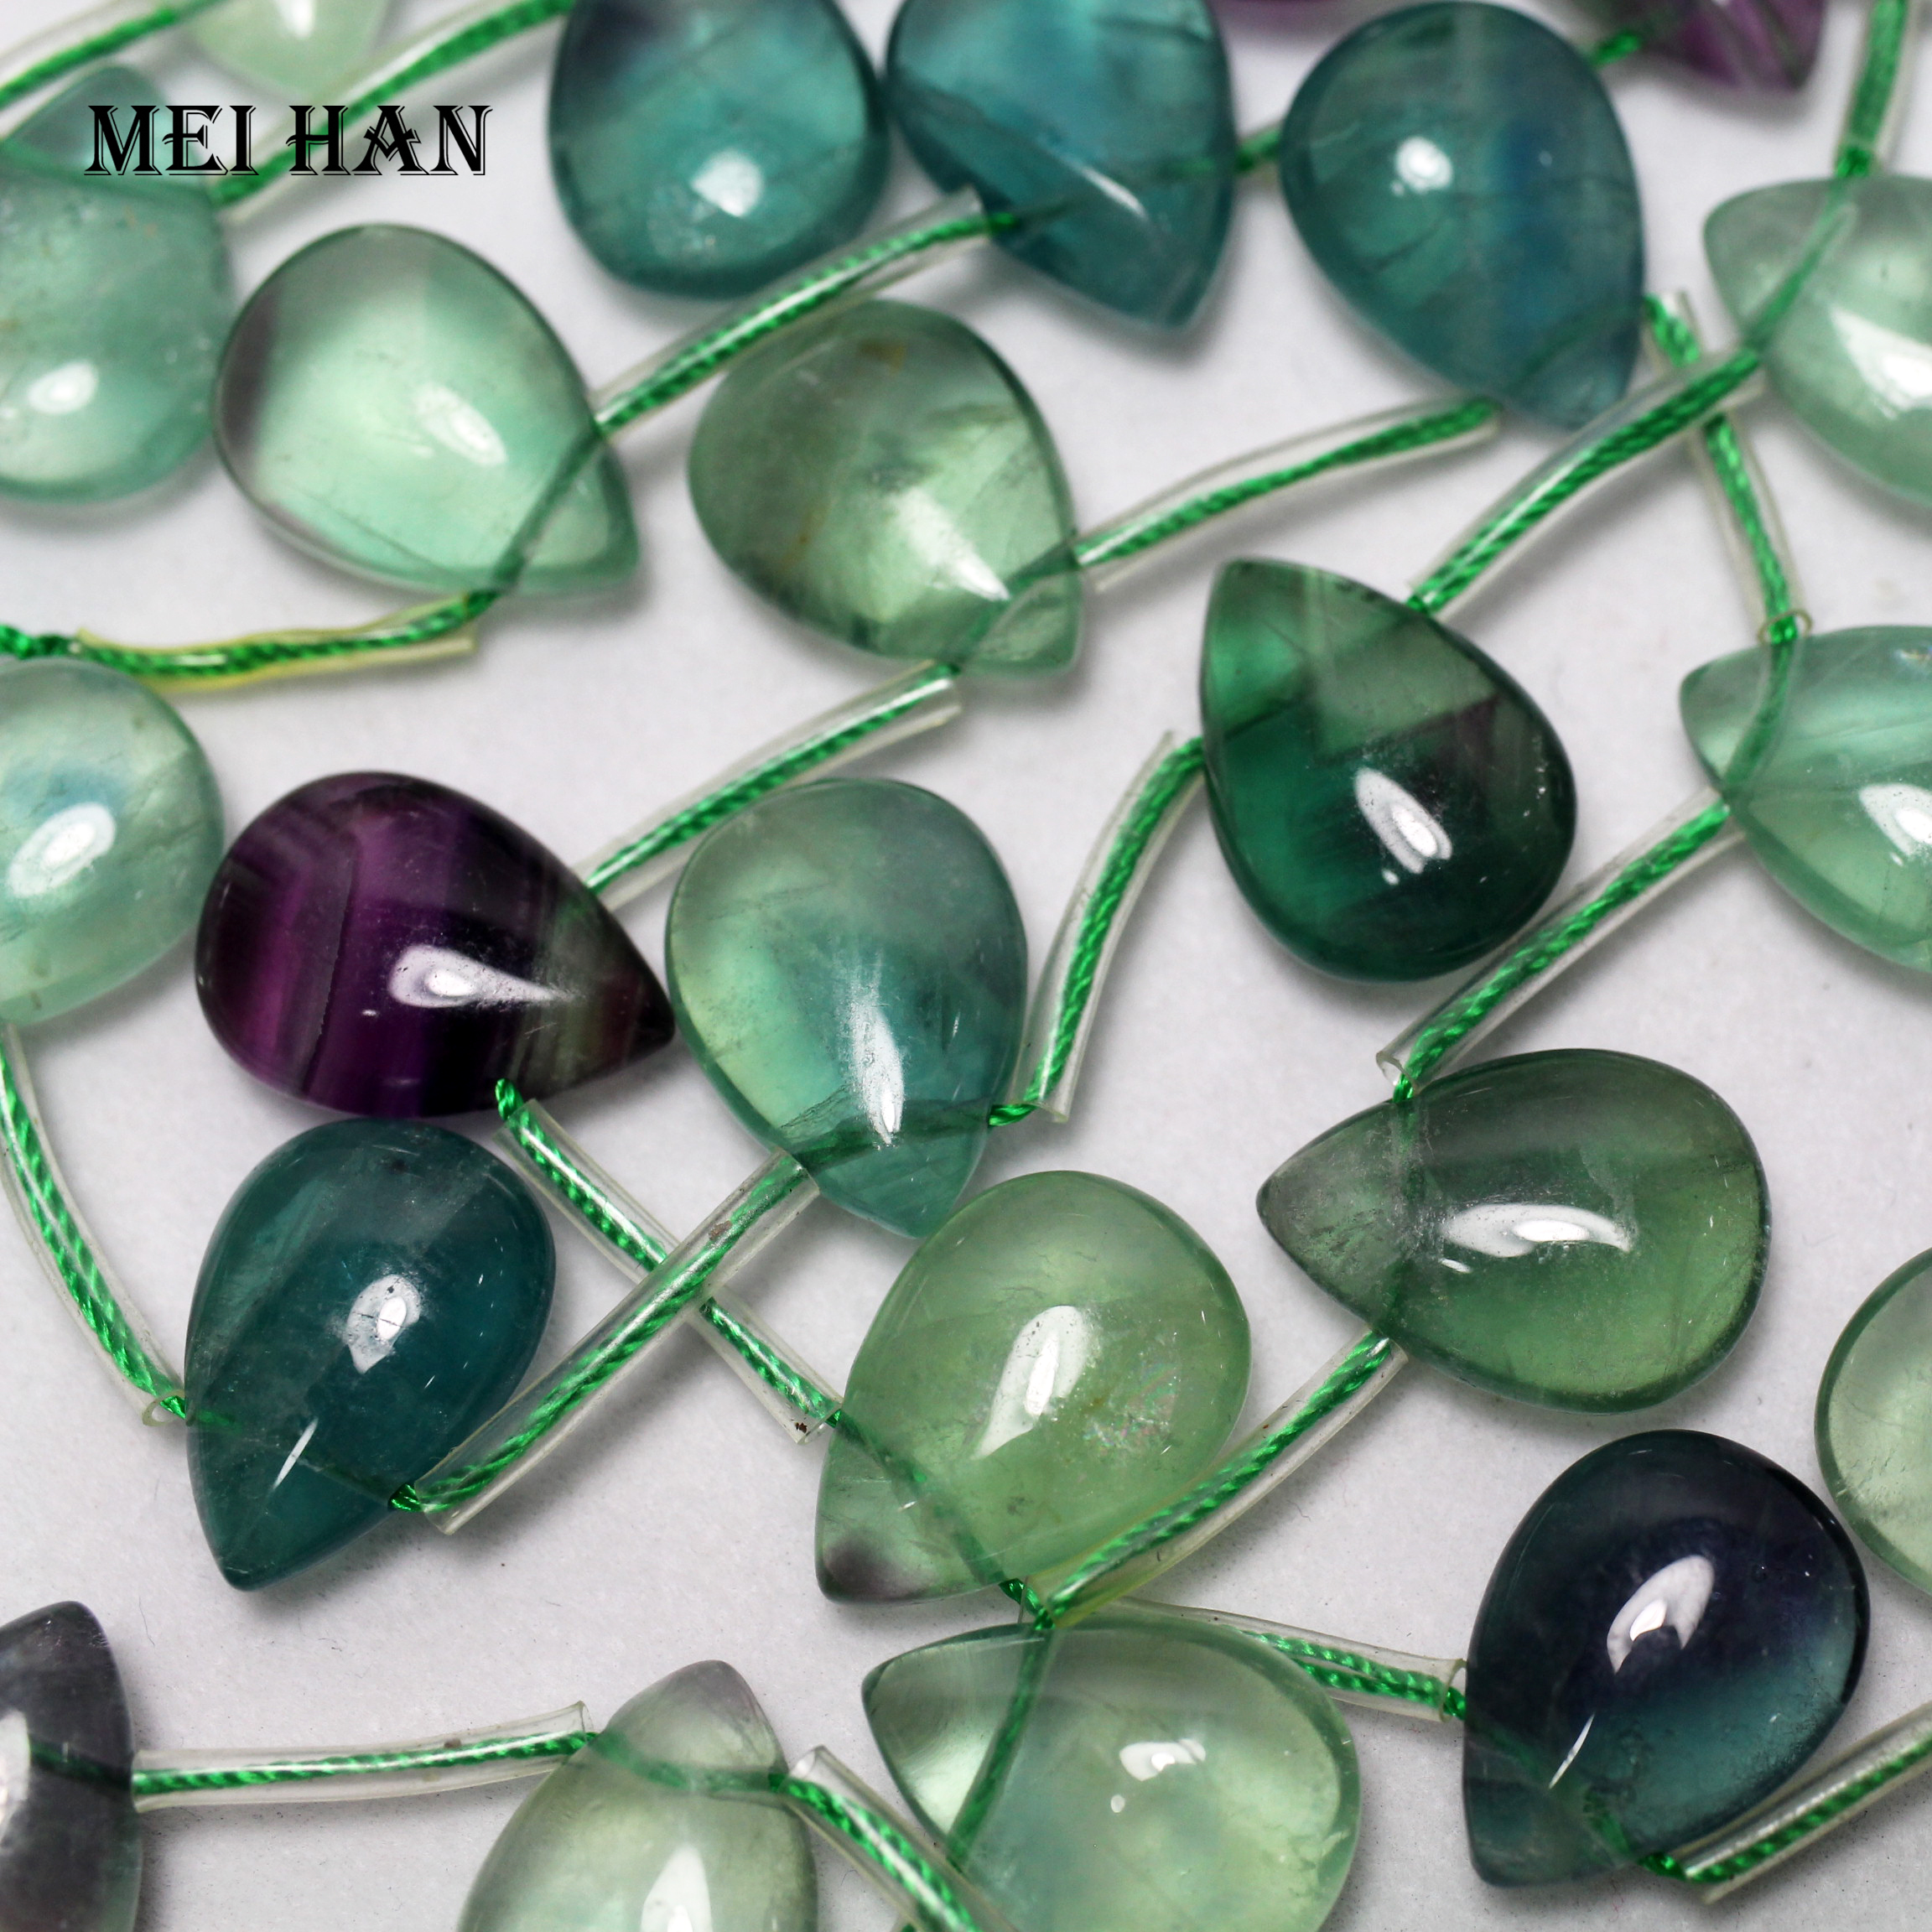 Semi Precious Stone Jade Chalcedony Glass Quartz Faceted Round Teardrop Beads